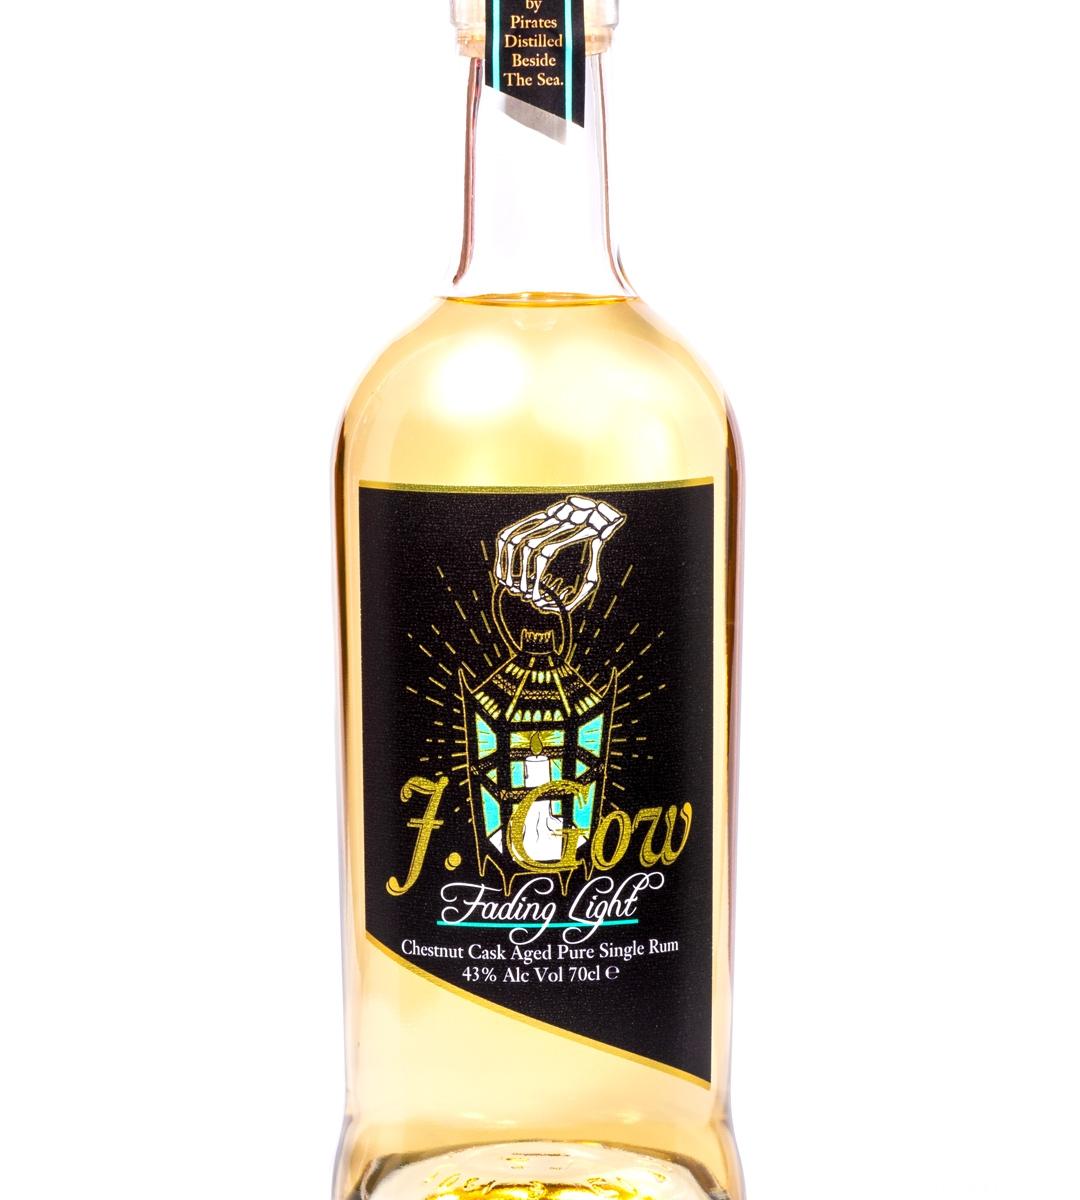 Scottish Chestnut cask aged pure single rum, J. Gow